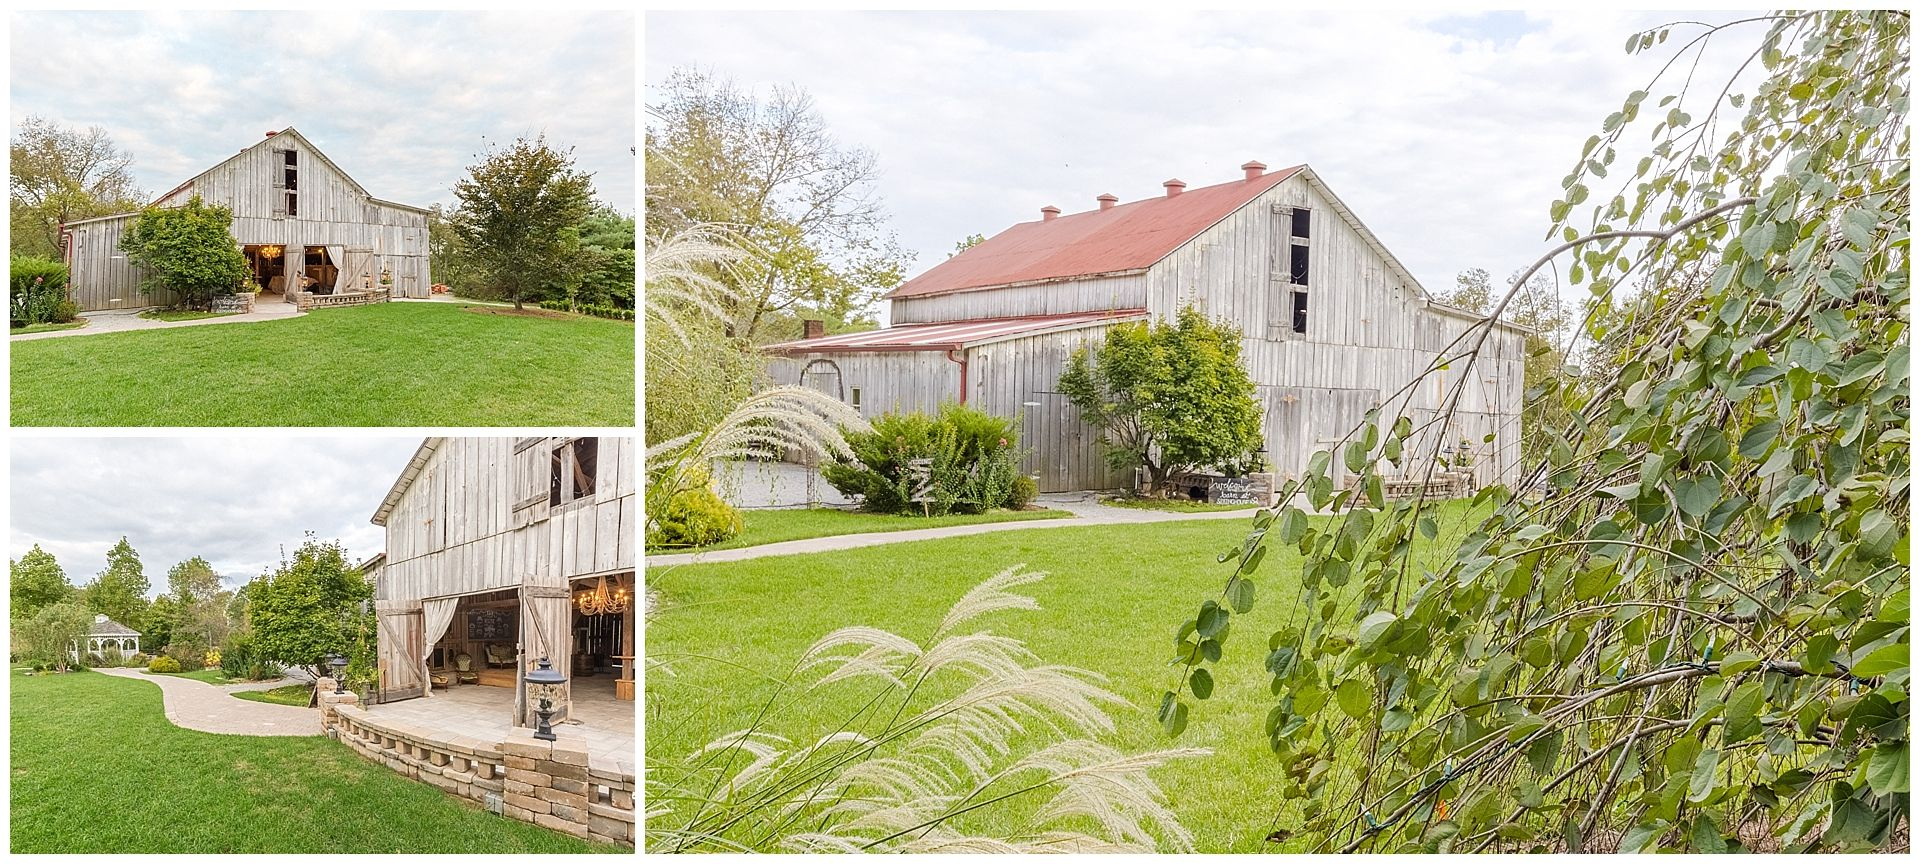 The Barn at Springhouse Gardens Wedding Venue in ...